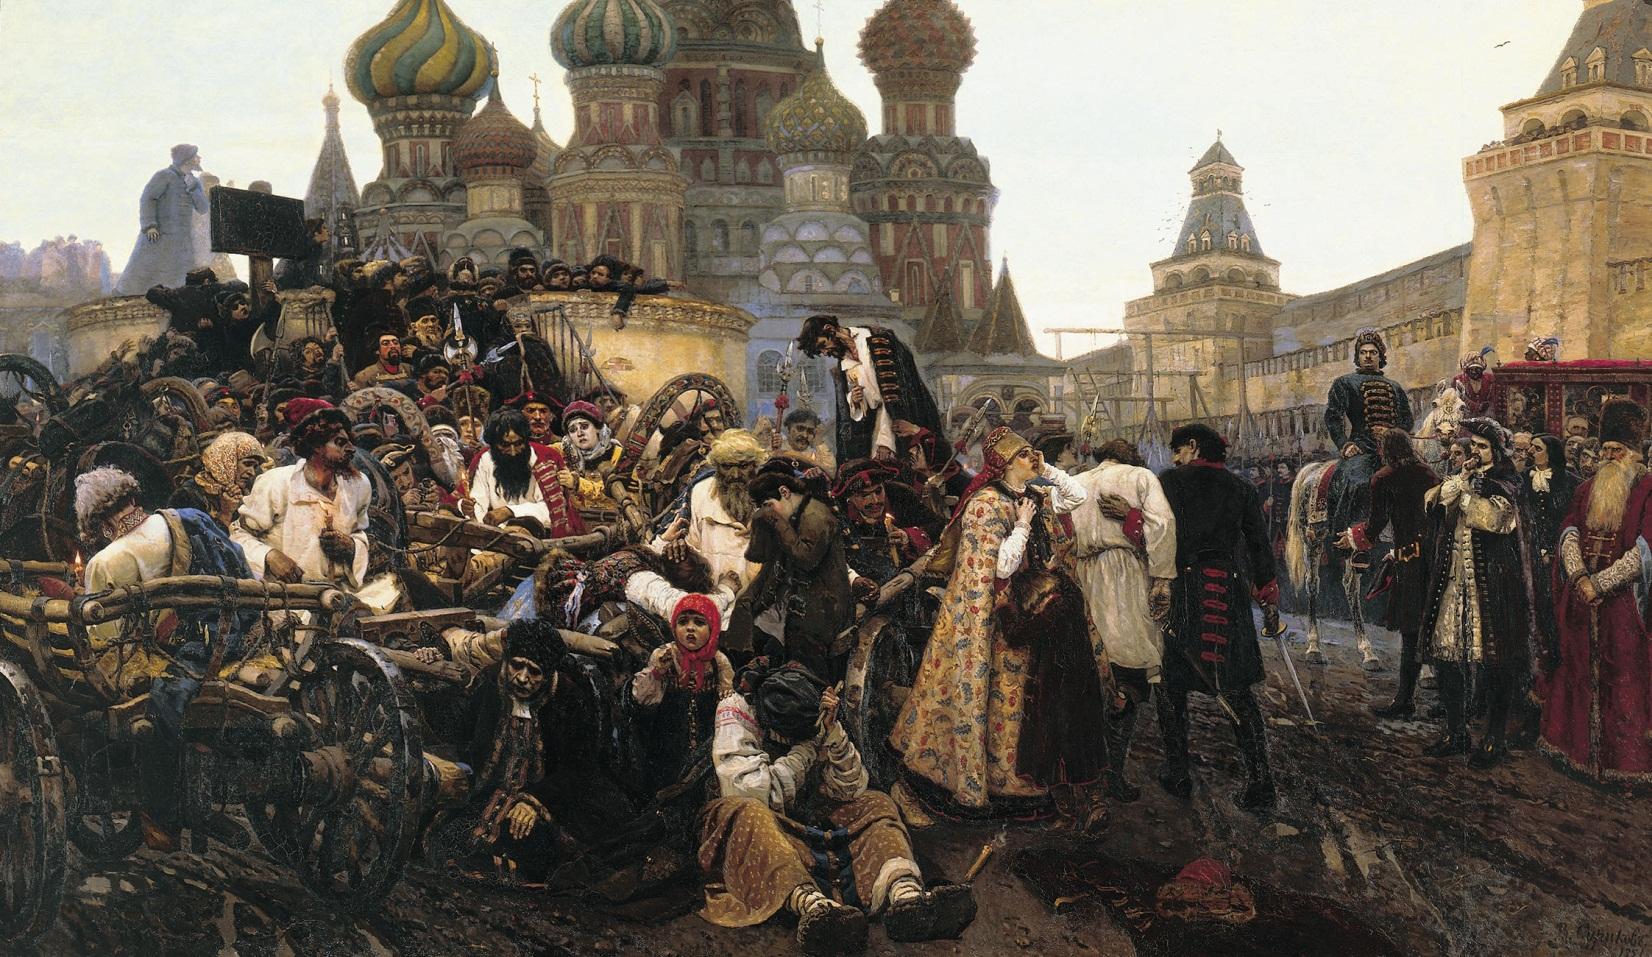 surikov-la manana de la ejecucion de los streltsy